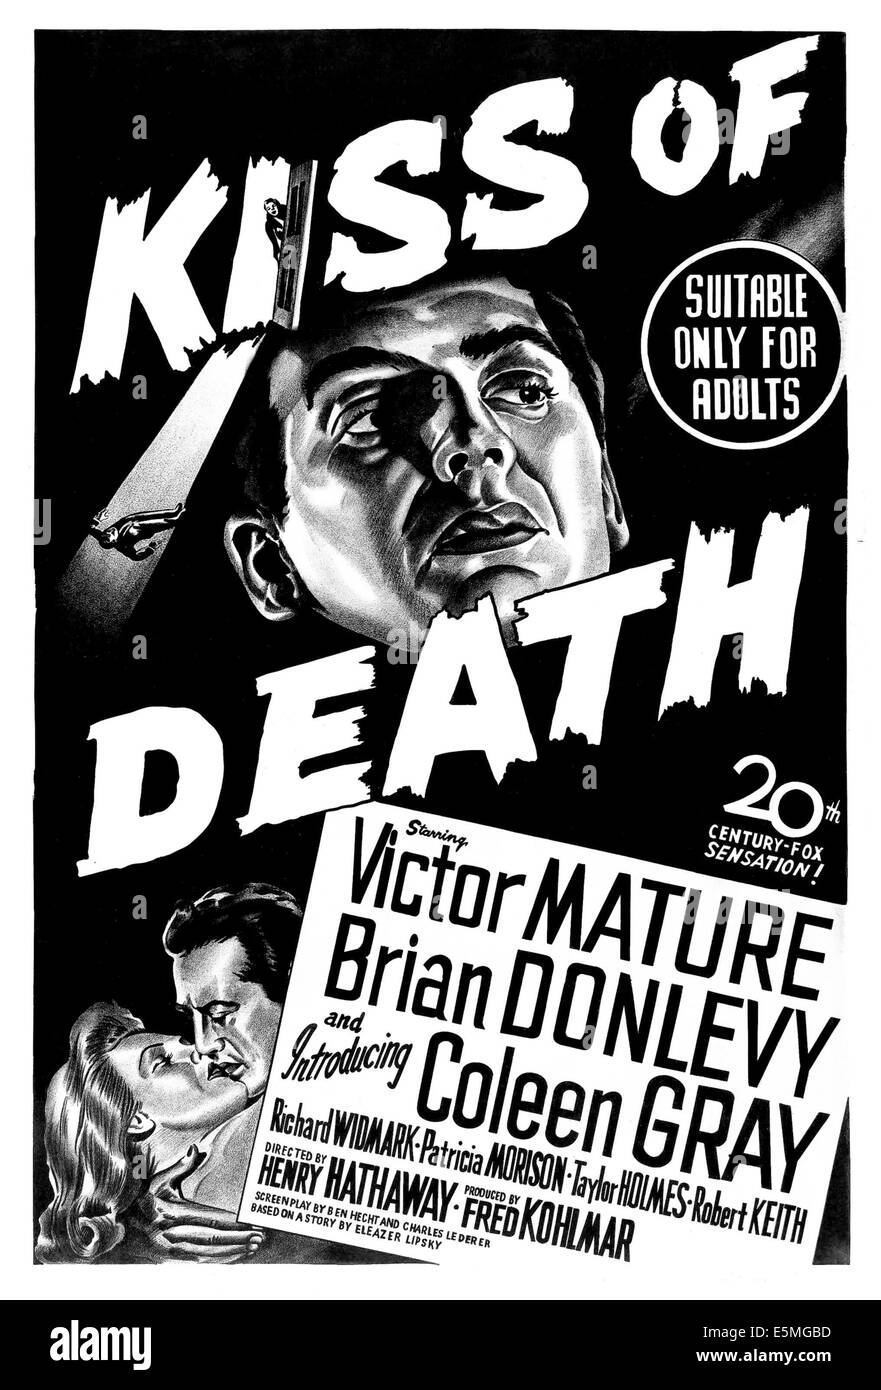 Las ultimas peliculas que has visto - Página 37 Kiss-of-death-coleen-gray-victor-mature-australian-poster-art-1947-E5MGBD